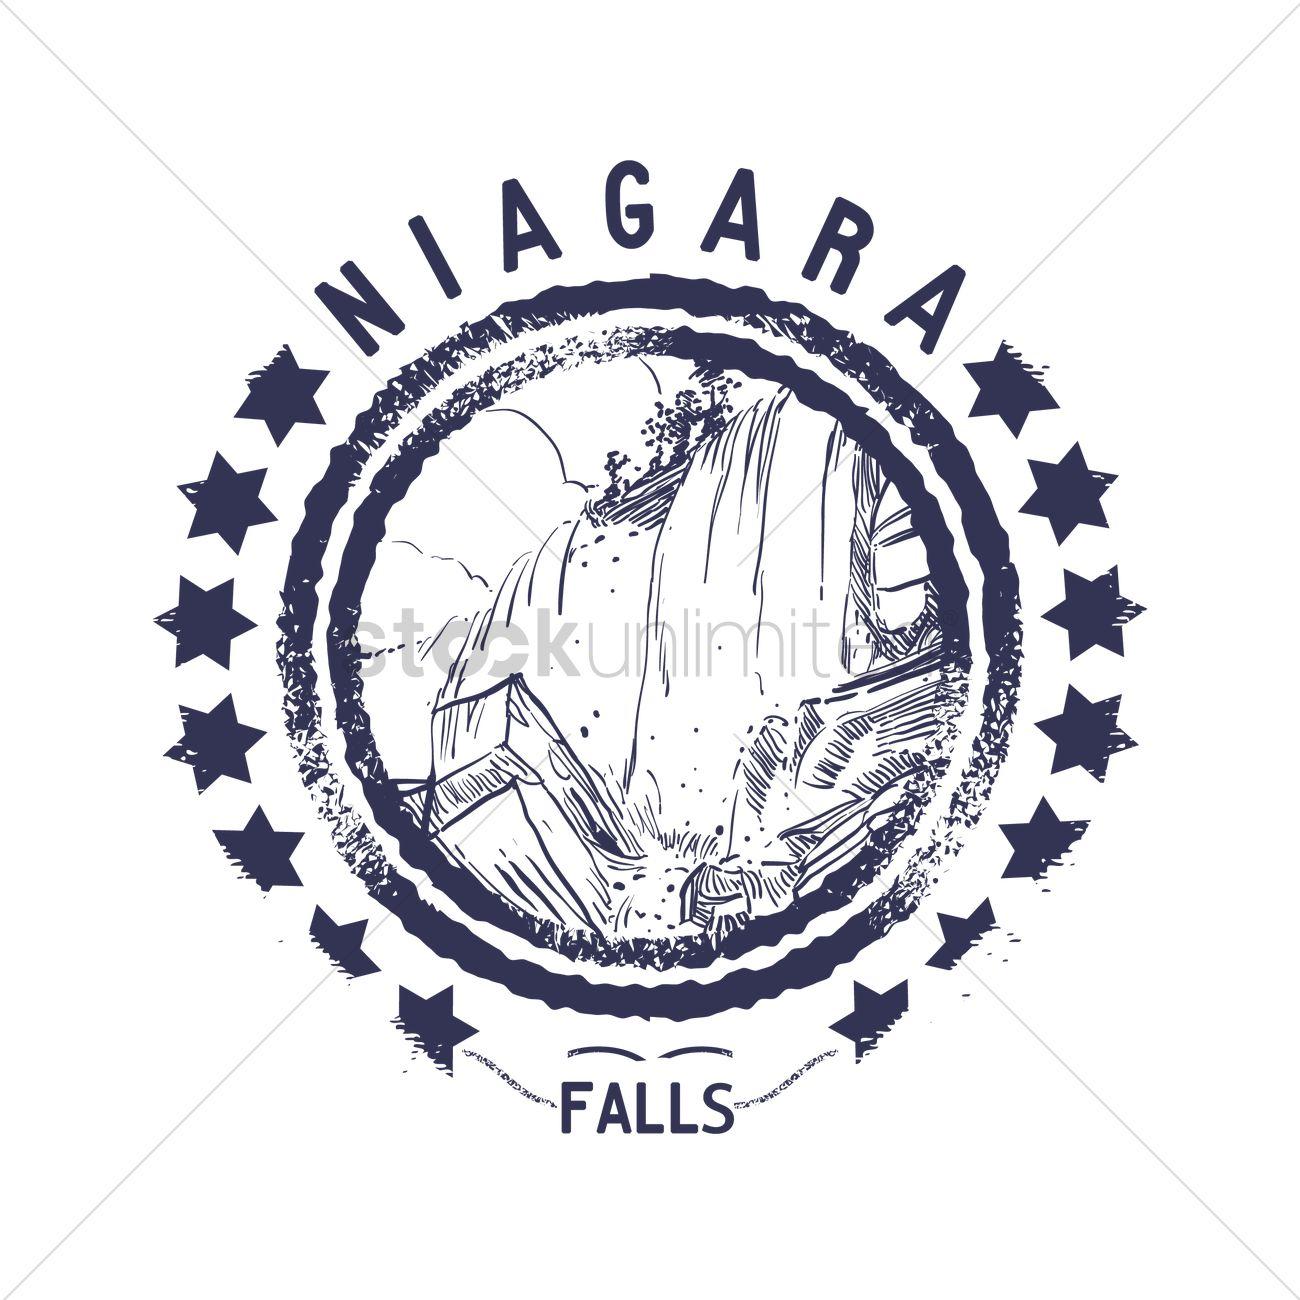 Grunge rubber stamp of niagara falls Vector Image.